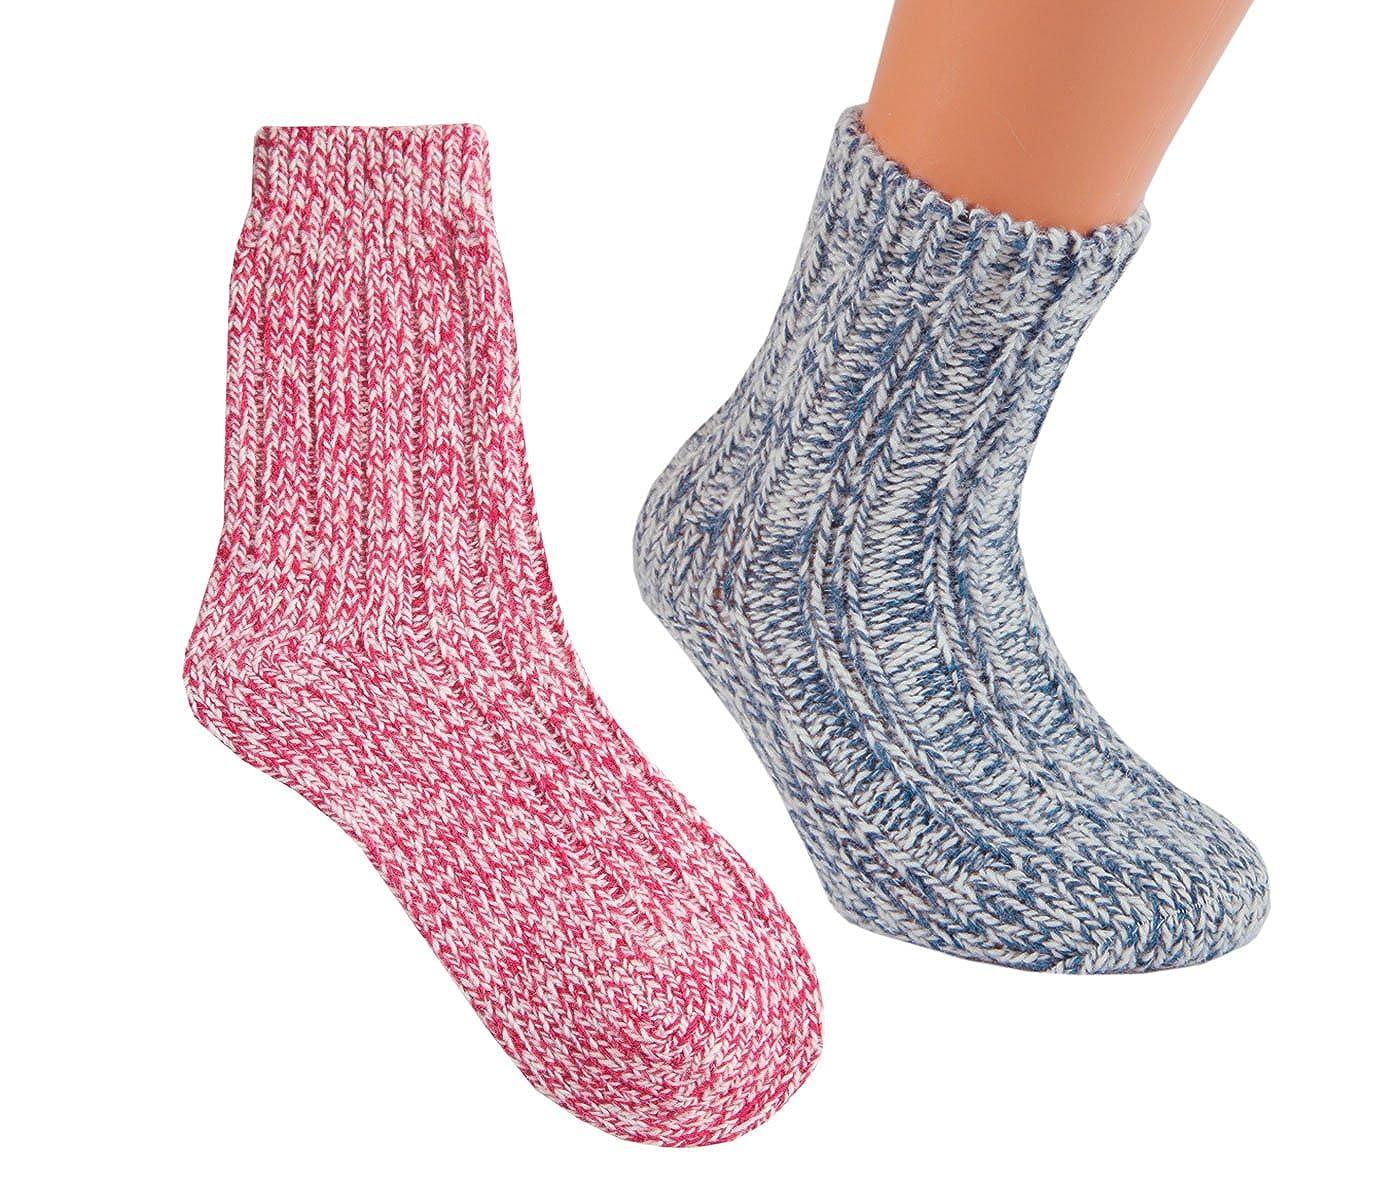 Vitasox Kinder Socken Wollsocken Norwegersocken Jungen Mädchen bunt 20812